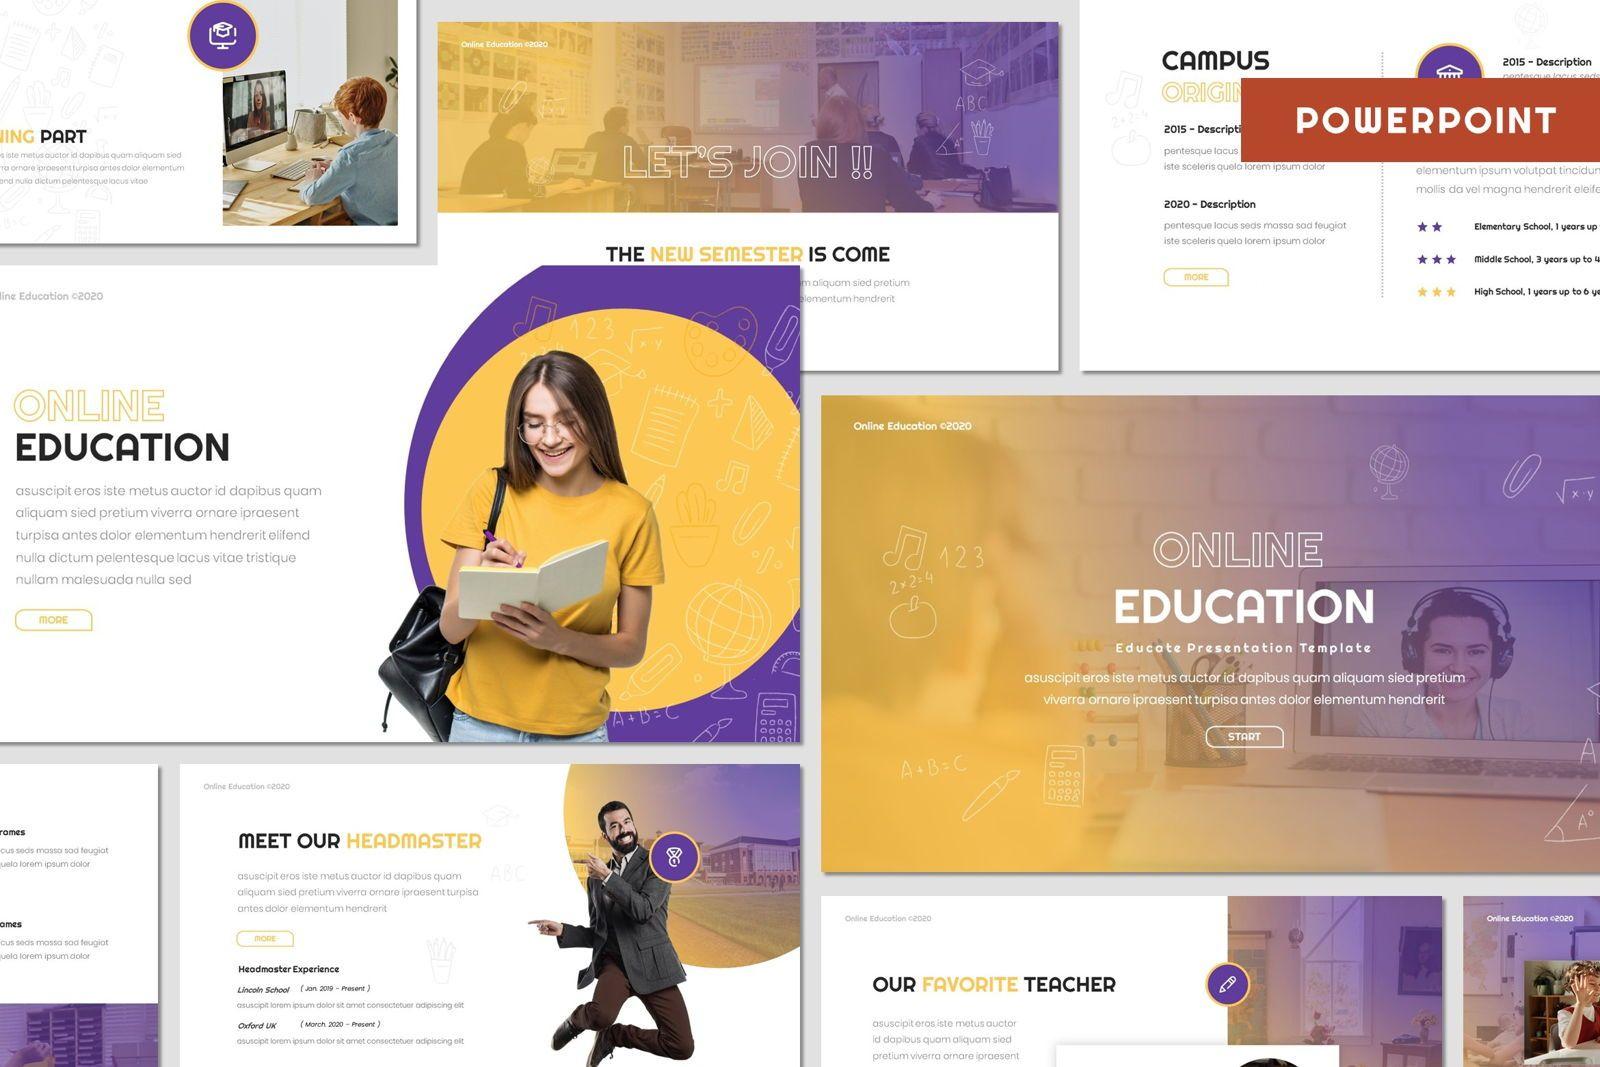 Online Education - Powerpoint Template, 08034, Presentation Templates — PoweredTemplate.com